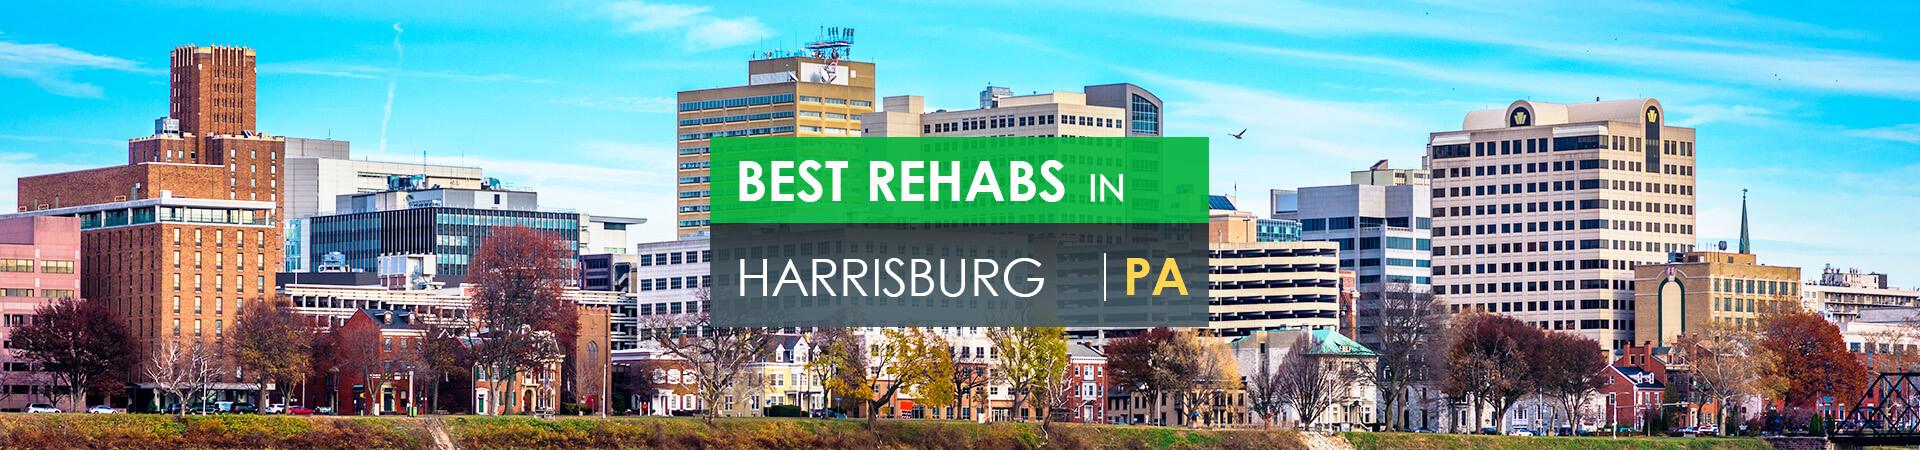 Best rehabs in Harrisburg, PA